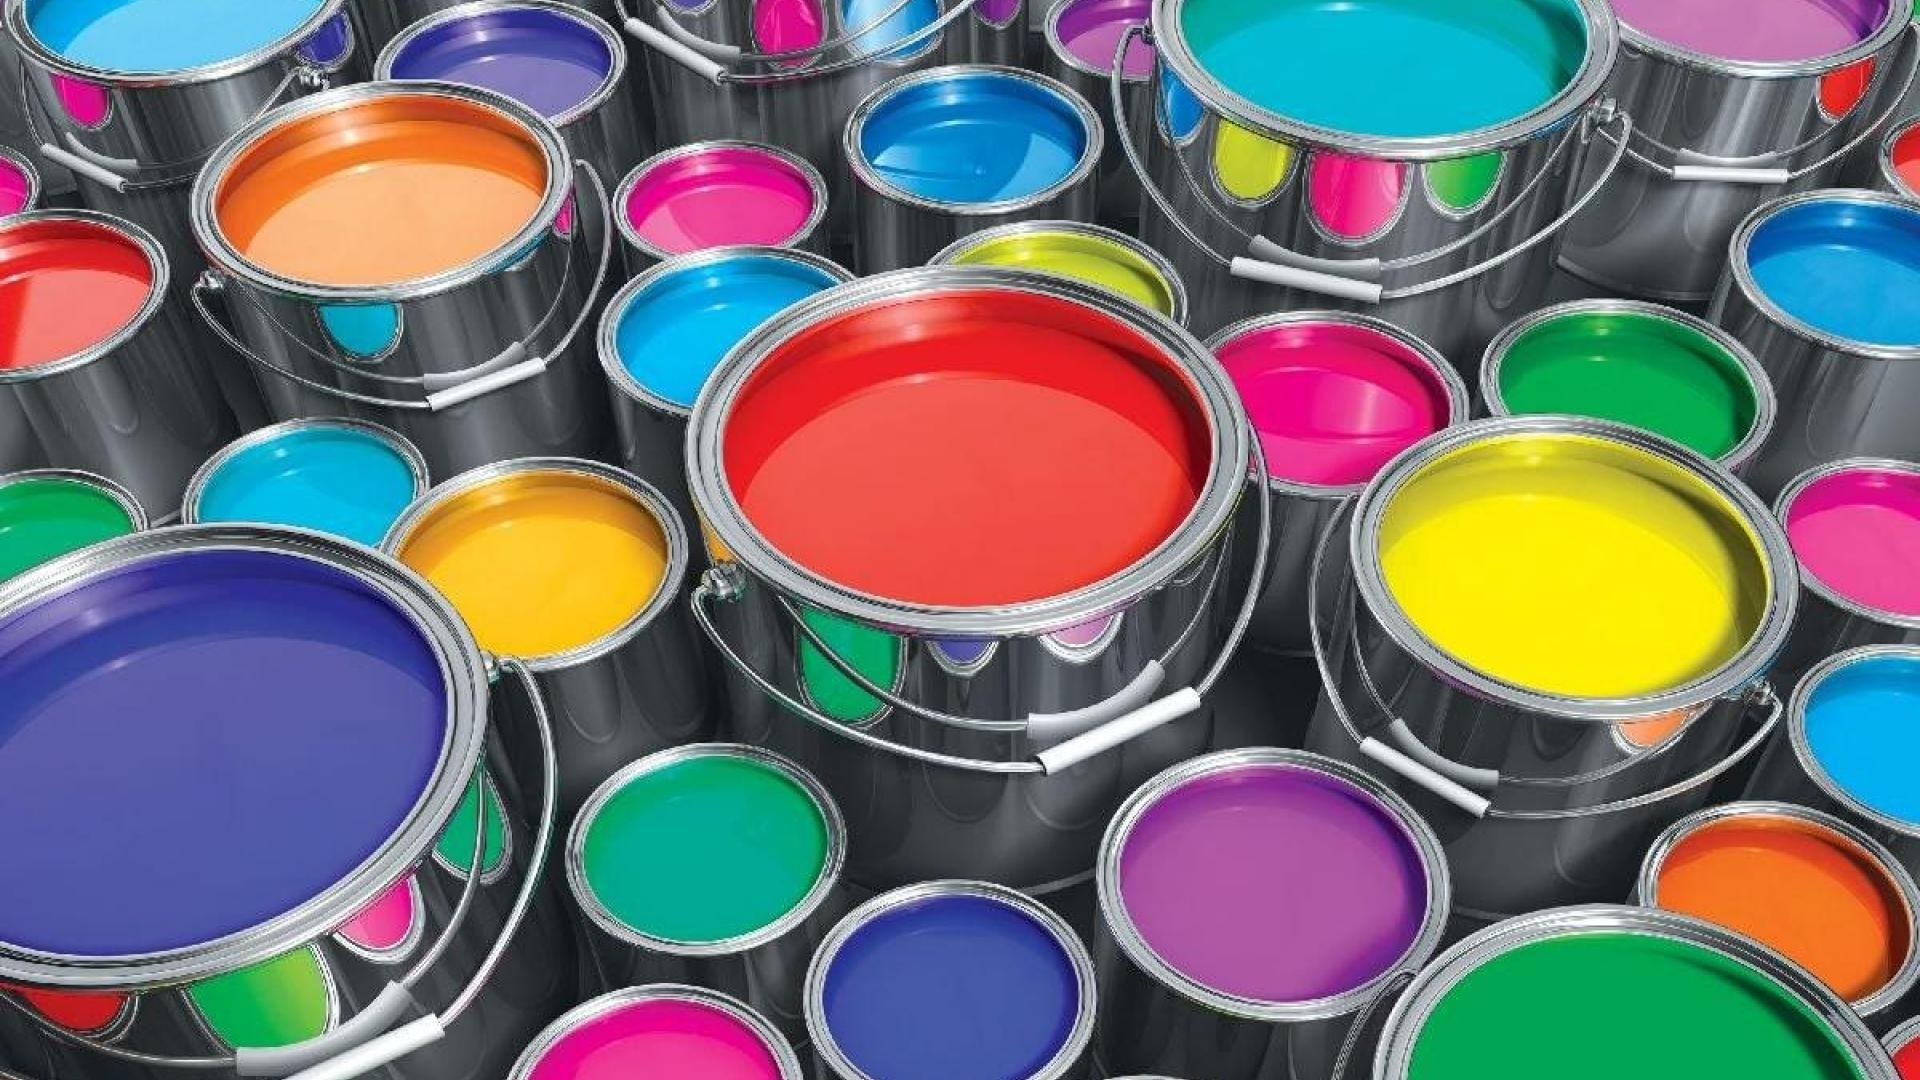 Pin By Vijaya Prakash On United Colors Paint Companies Paint Maker House Painting